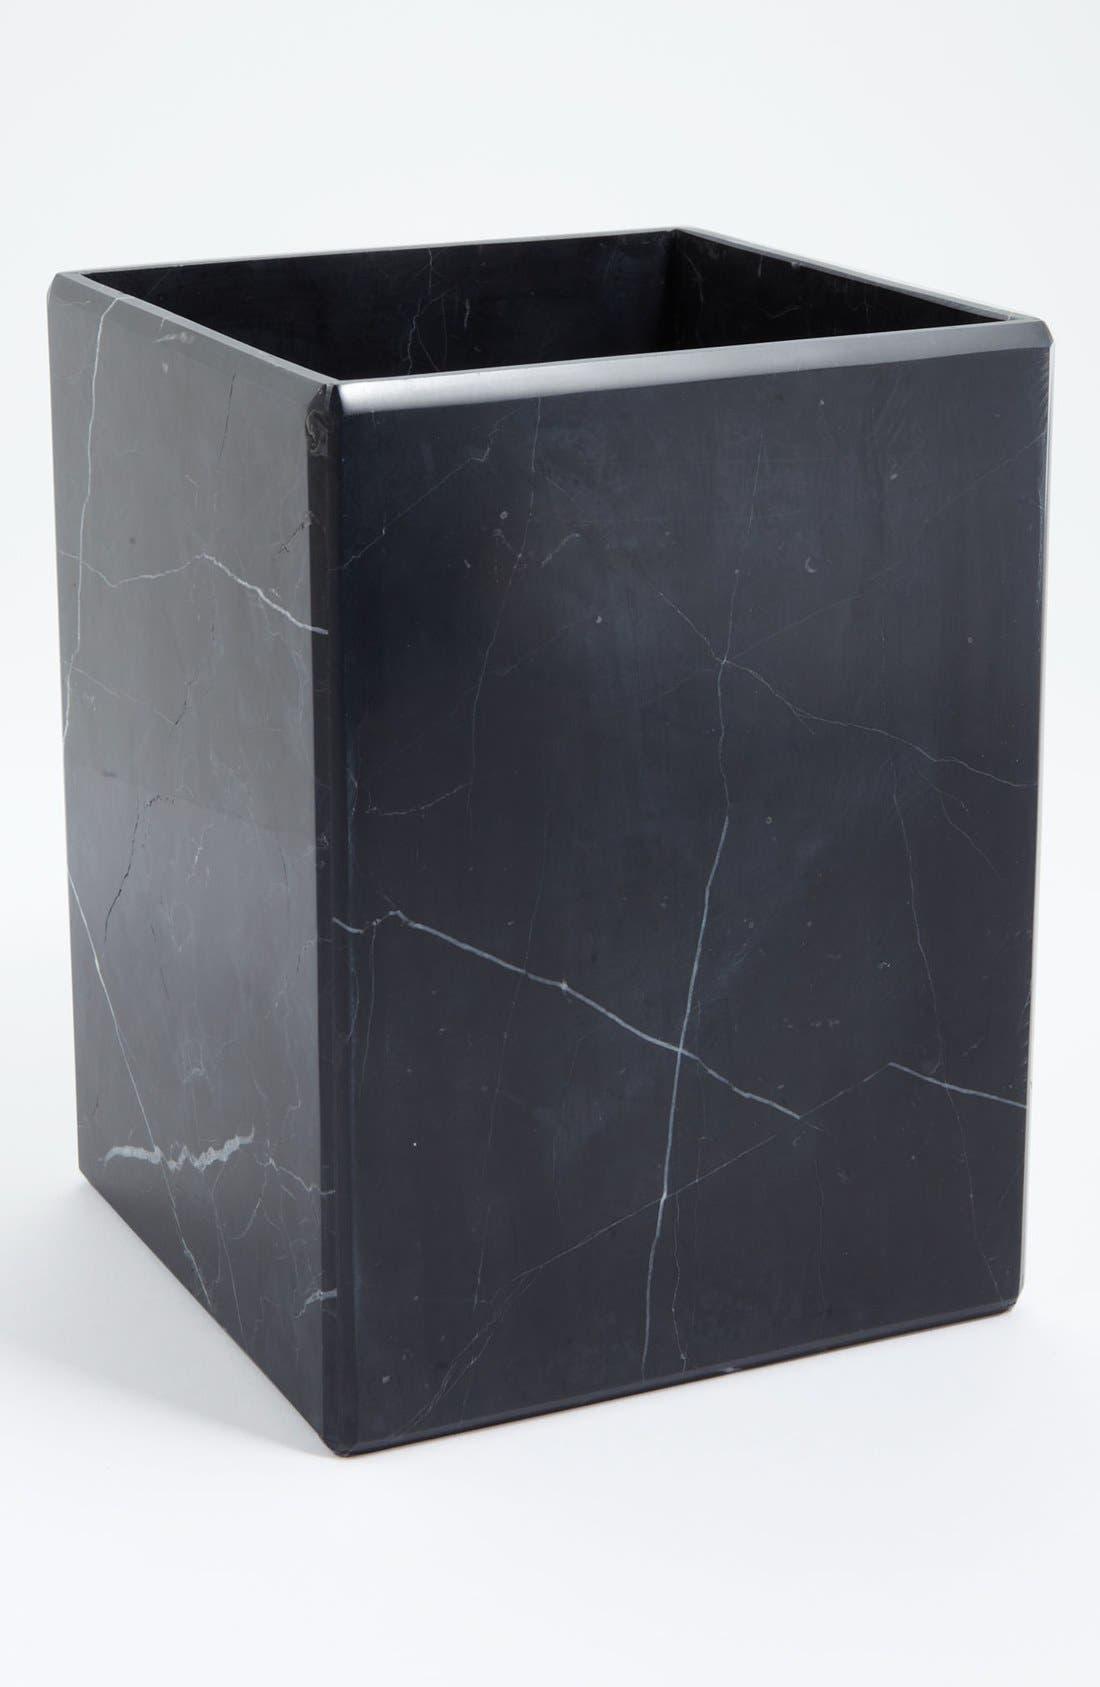 Waterworks Studio 'Luna' Black Marble Wastebasket (Online Only)